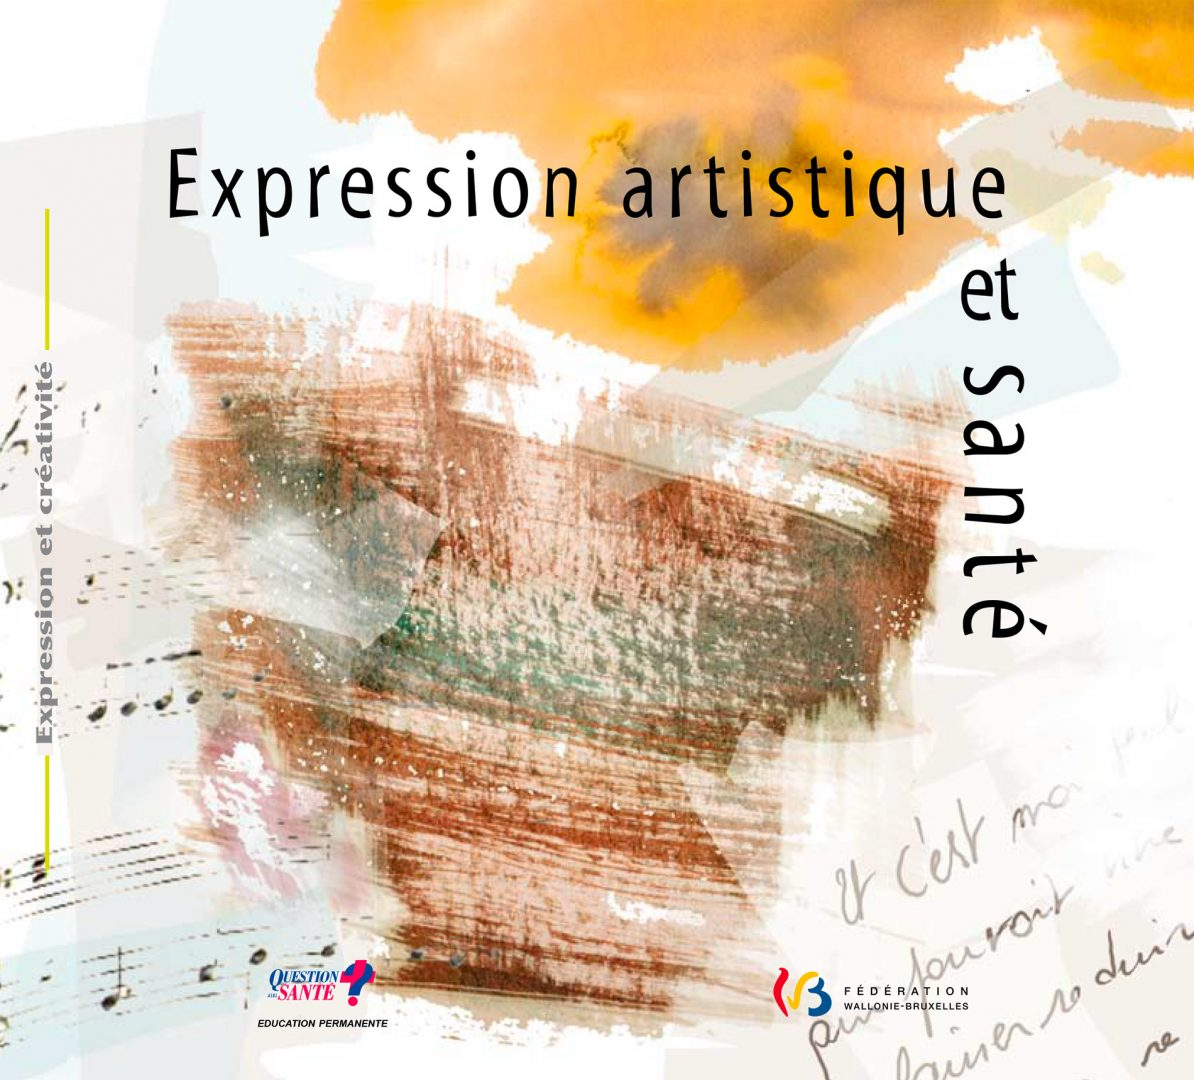 20120504 Img Expressionartistiquesante Bd Vf